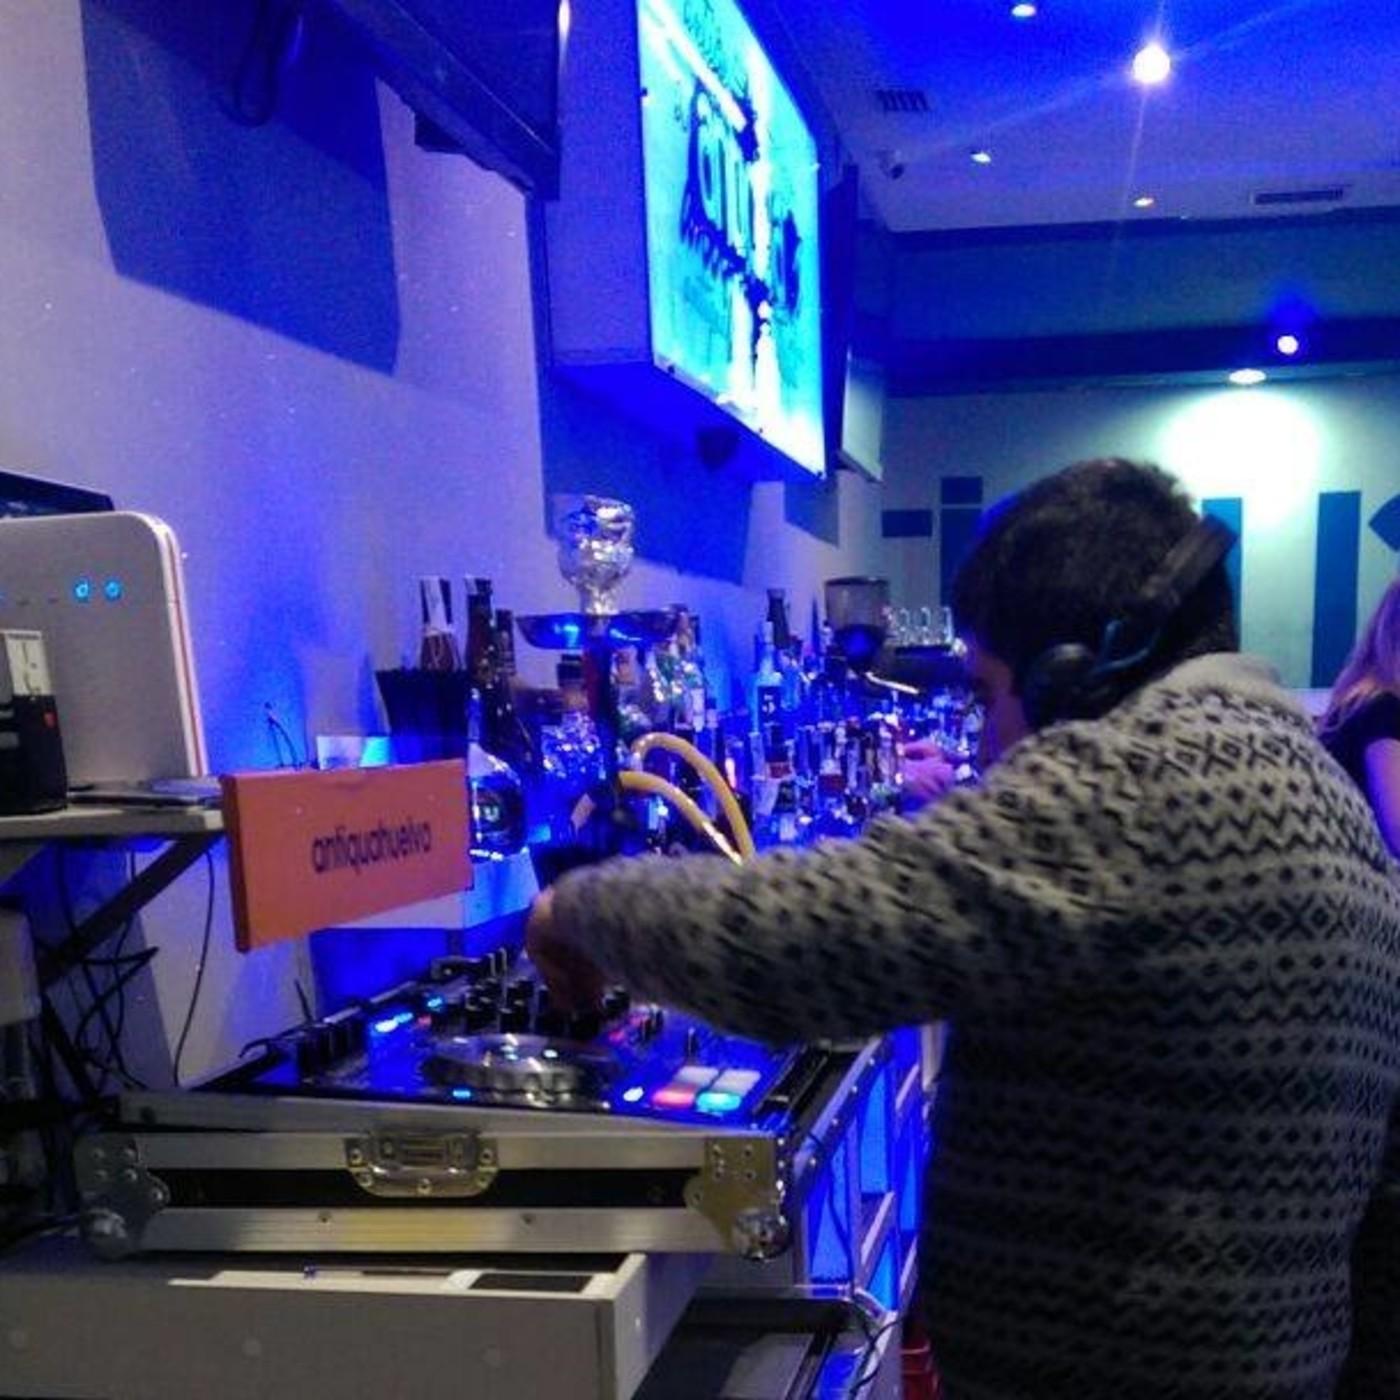 Cumpleanos Feliz Parchis Remix.Parchis Cumpleanos Feliz Dj Mojarro Huelva Remix 2018 V